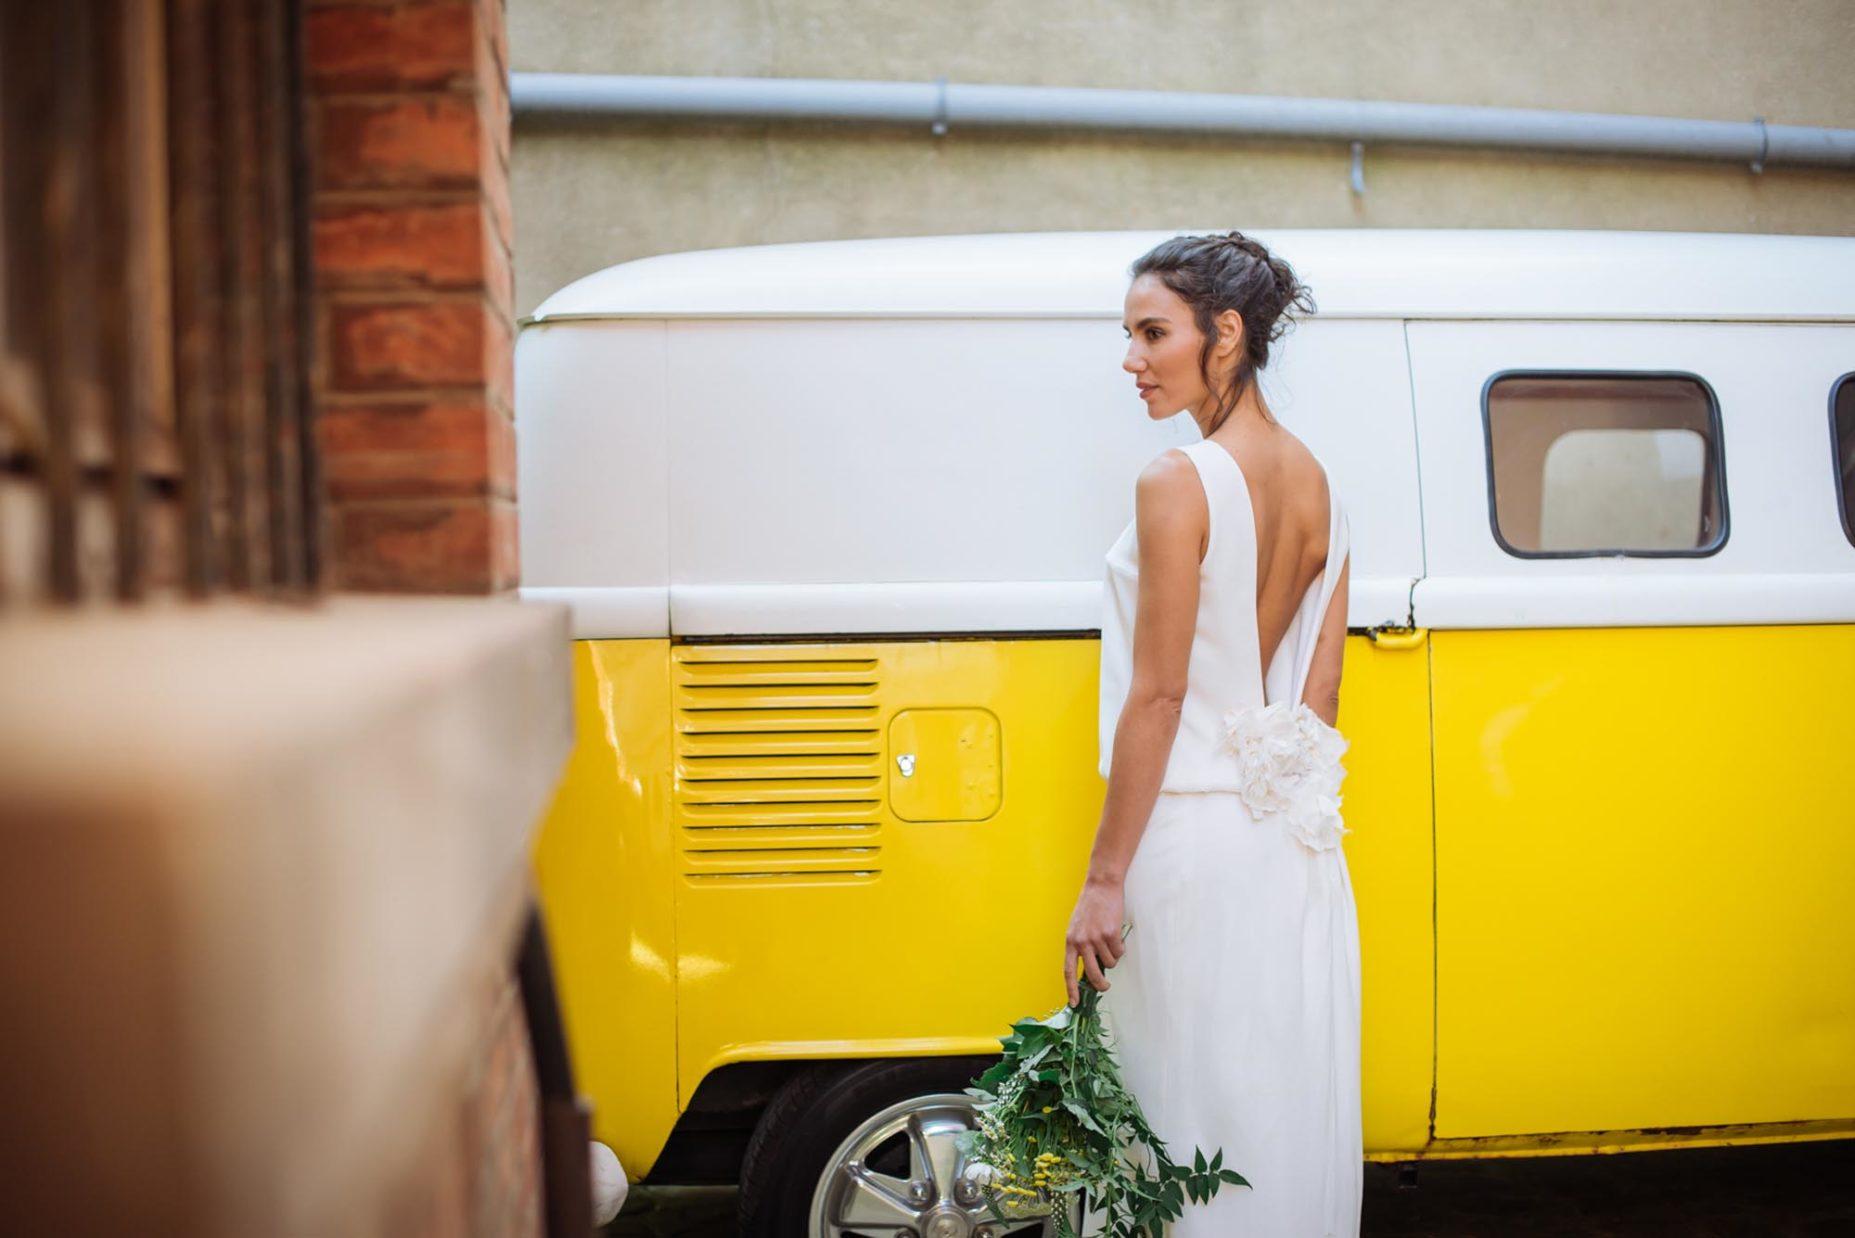 maldeme photographe mariage inspiration industriel paris lifestyle